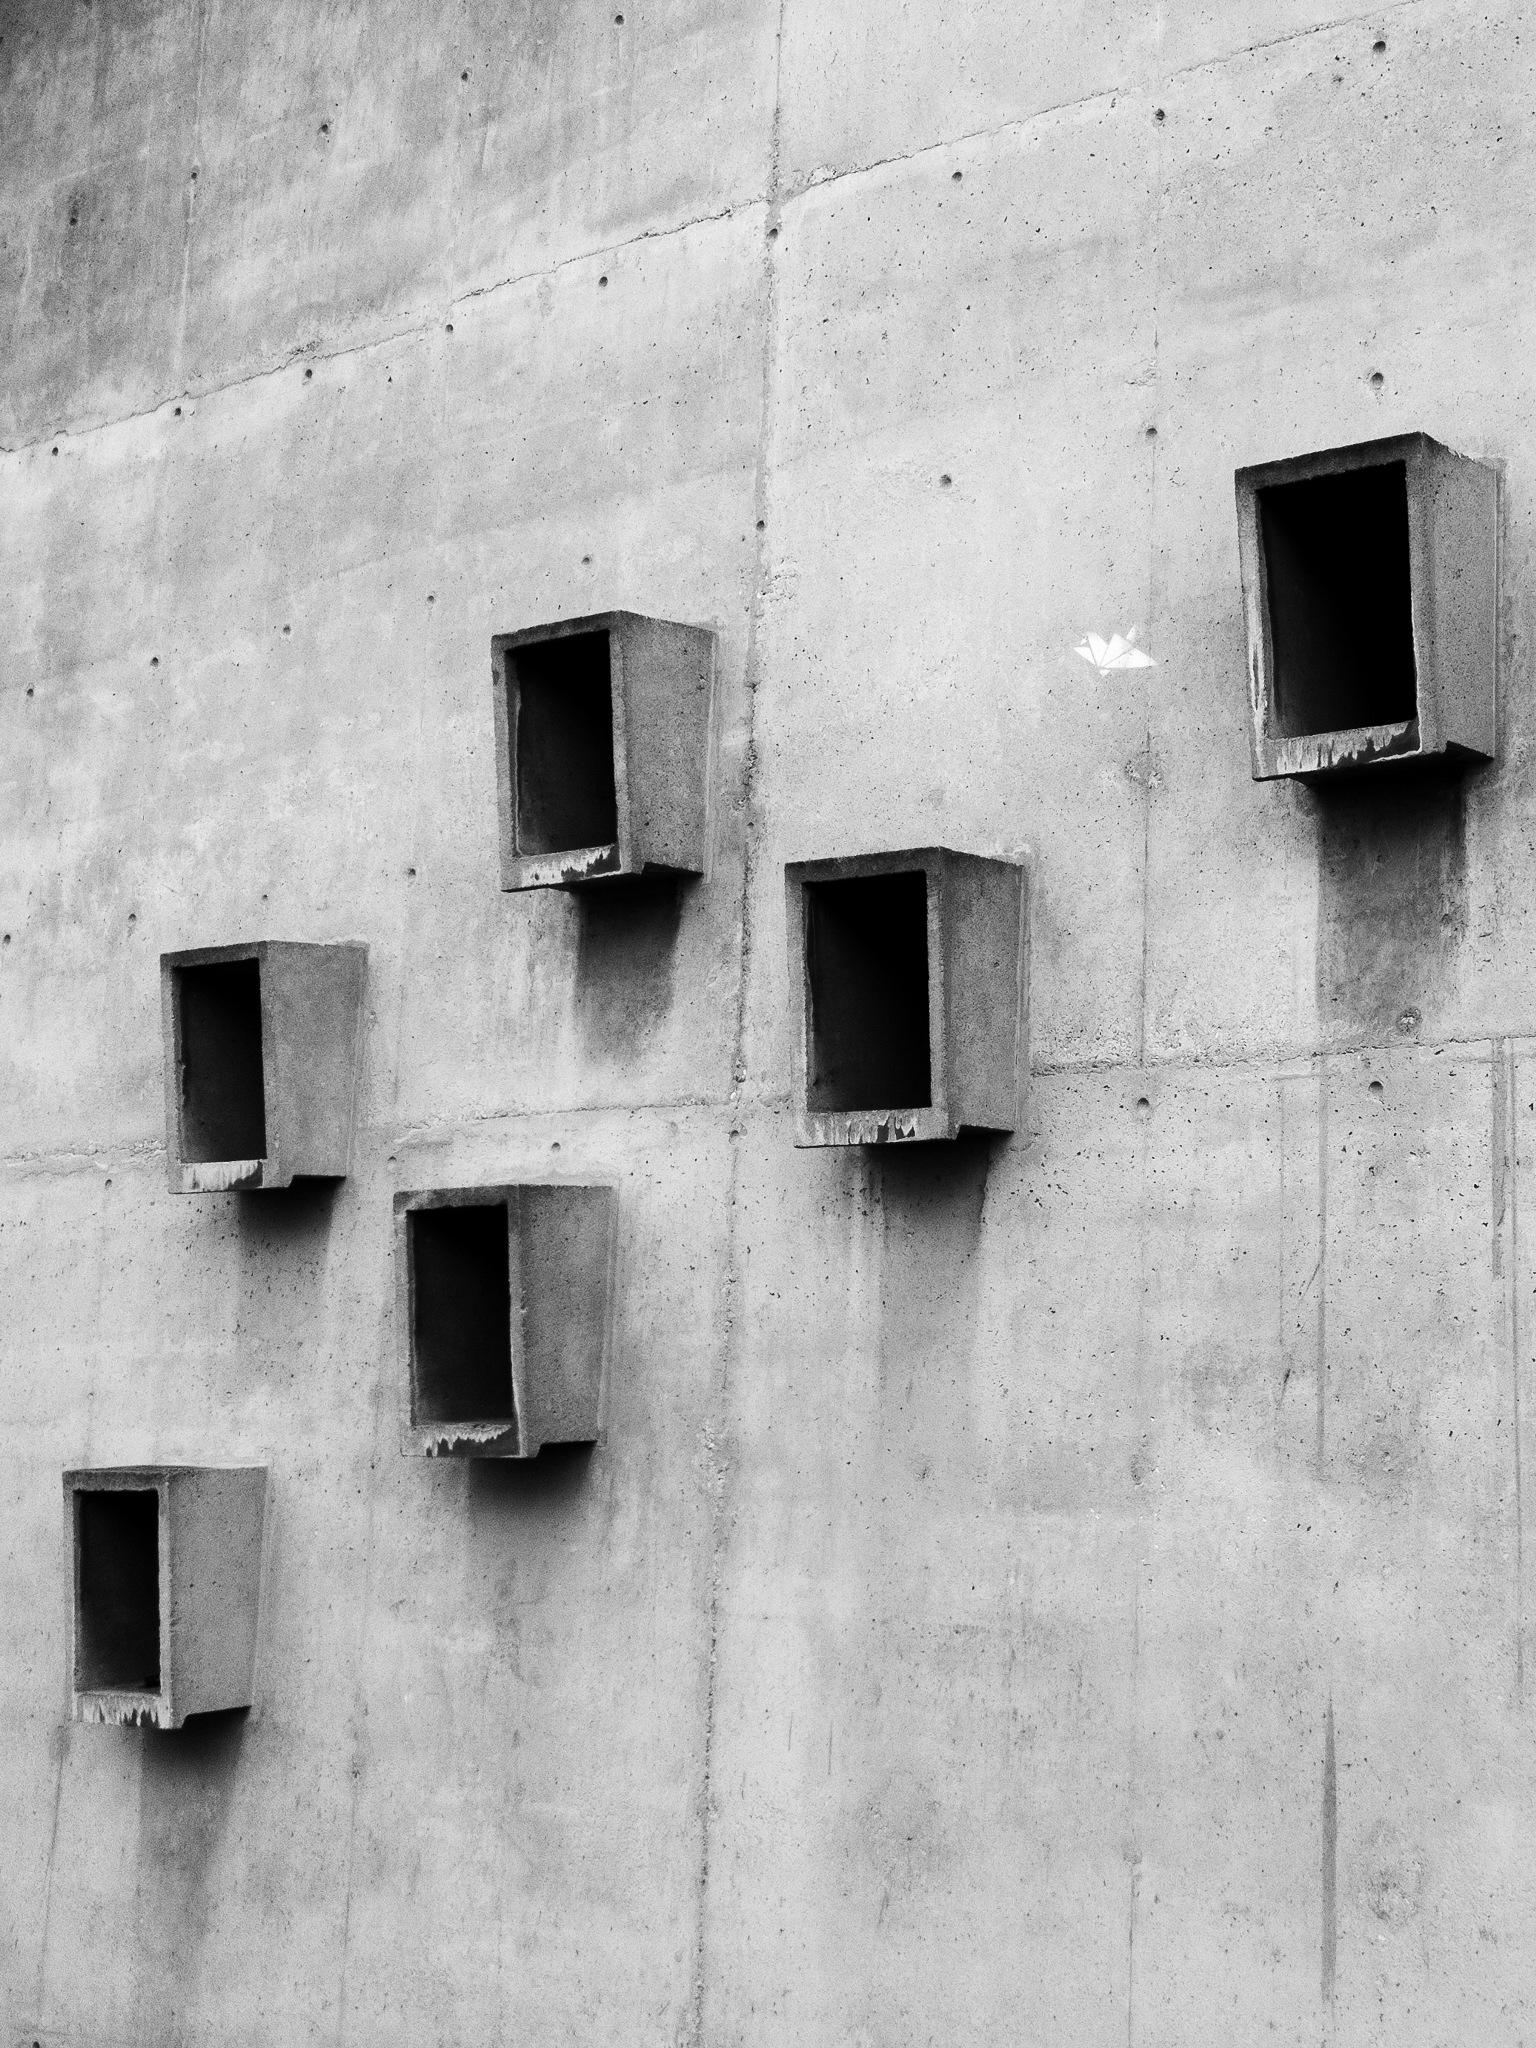 Square Windows in Diagonal by Valentin DETANG